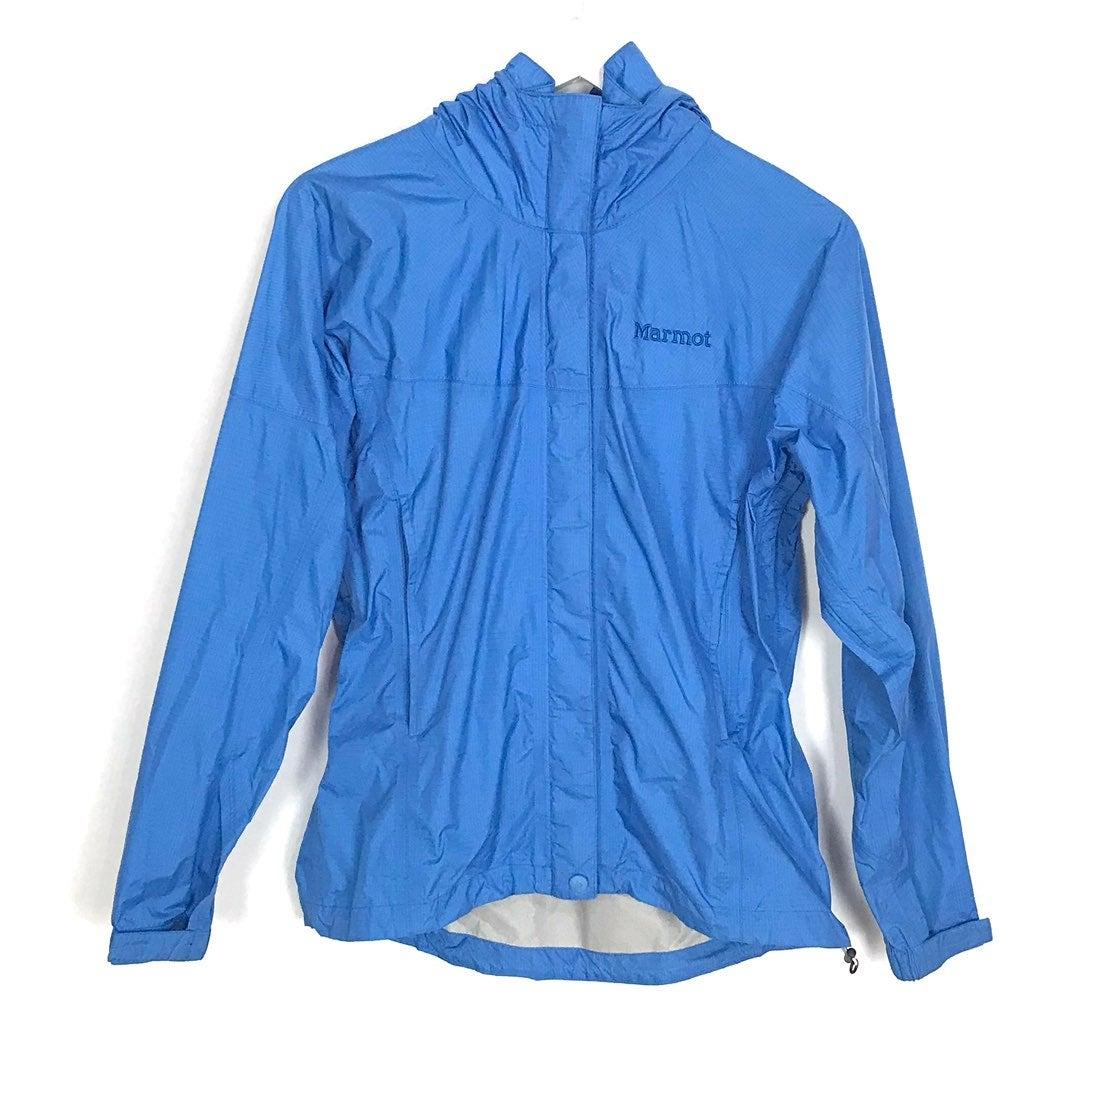 Marmot Precip Eco Rain Jacket